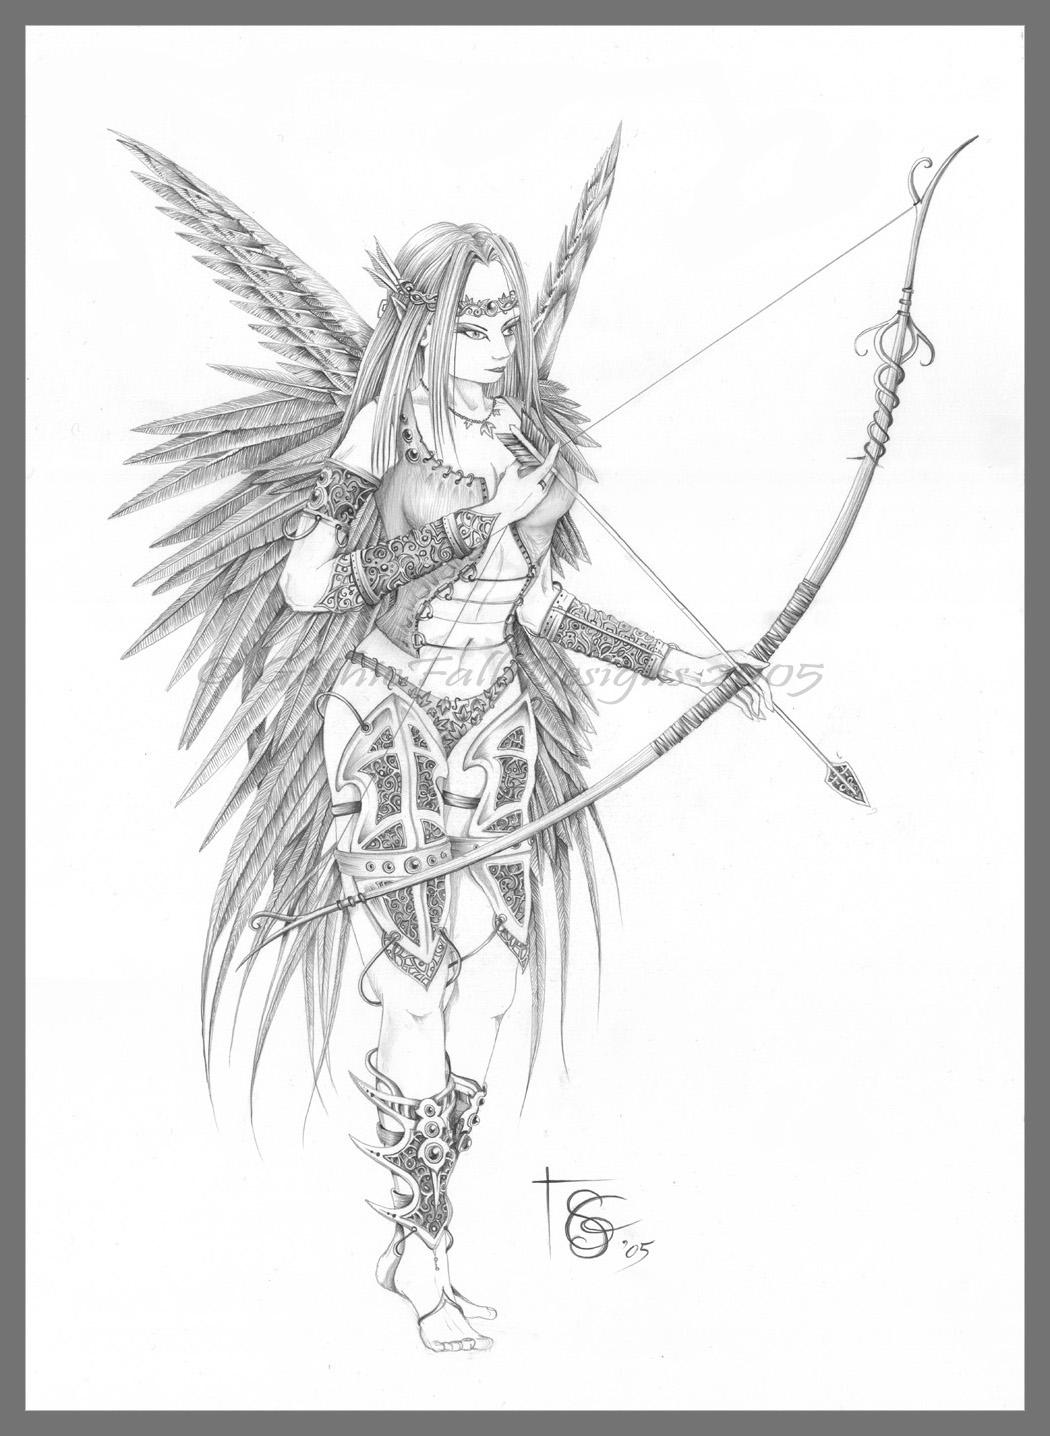 Drawn elf pencil drawing #4